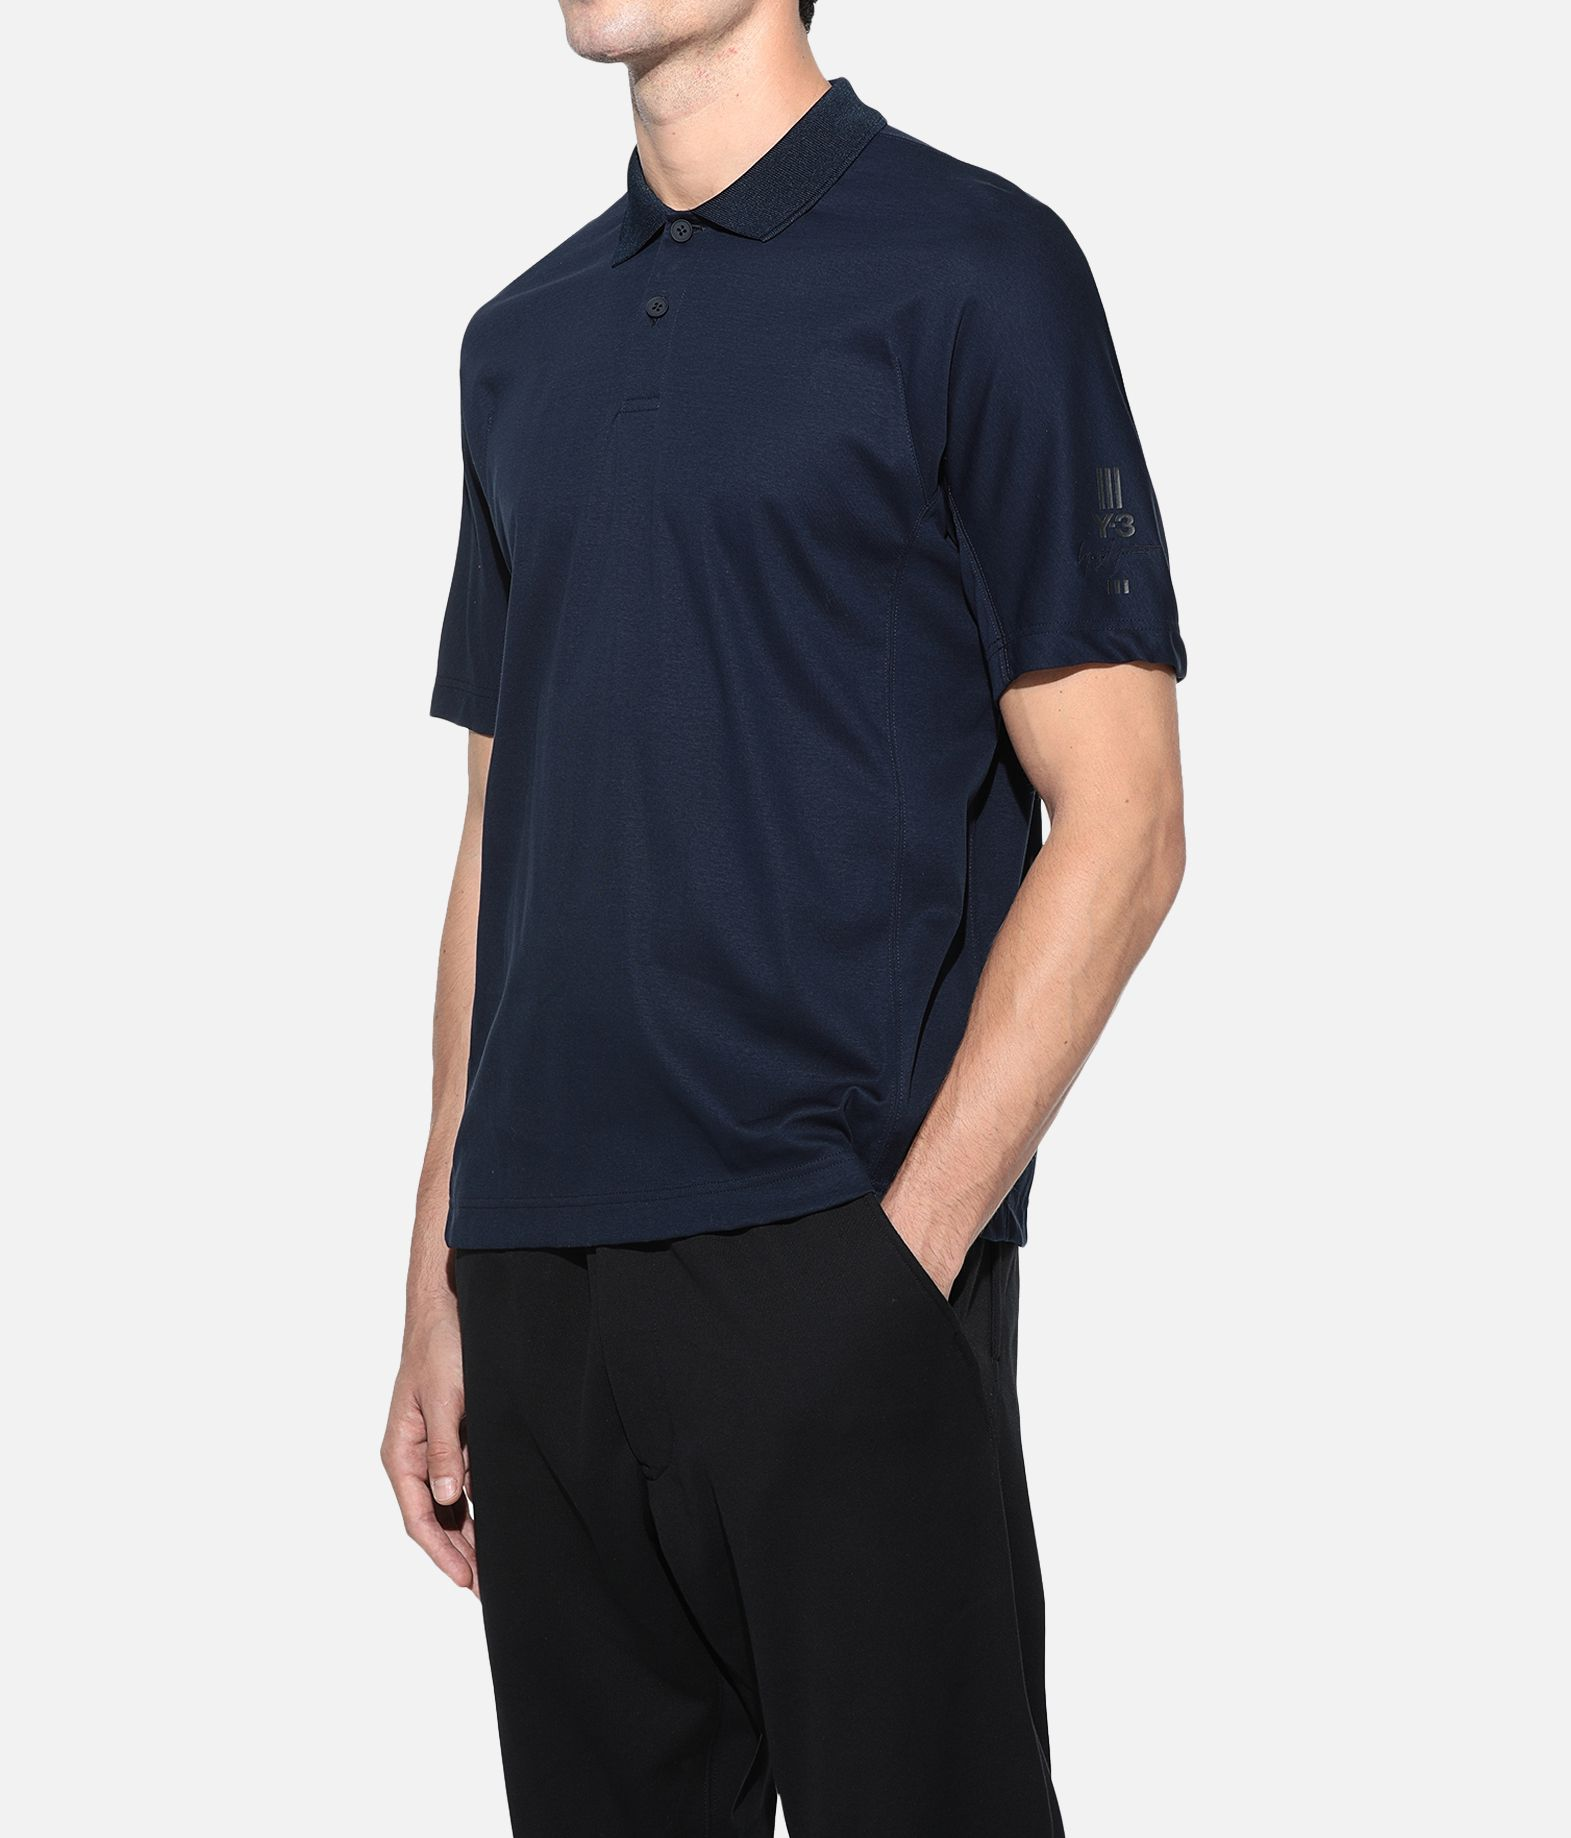 Y-3 Y-3 Classic Polo Shirt Polohemd Herren e